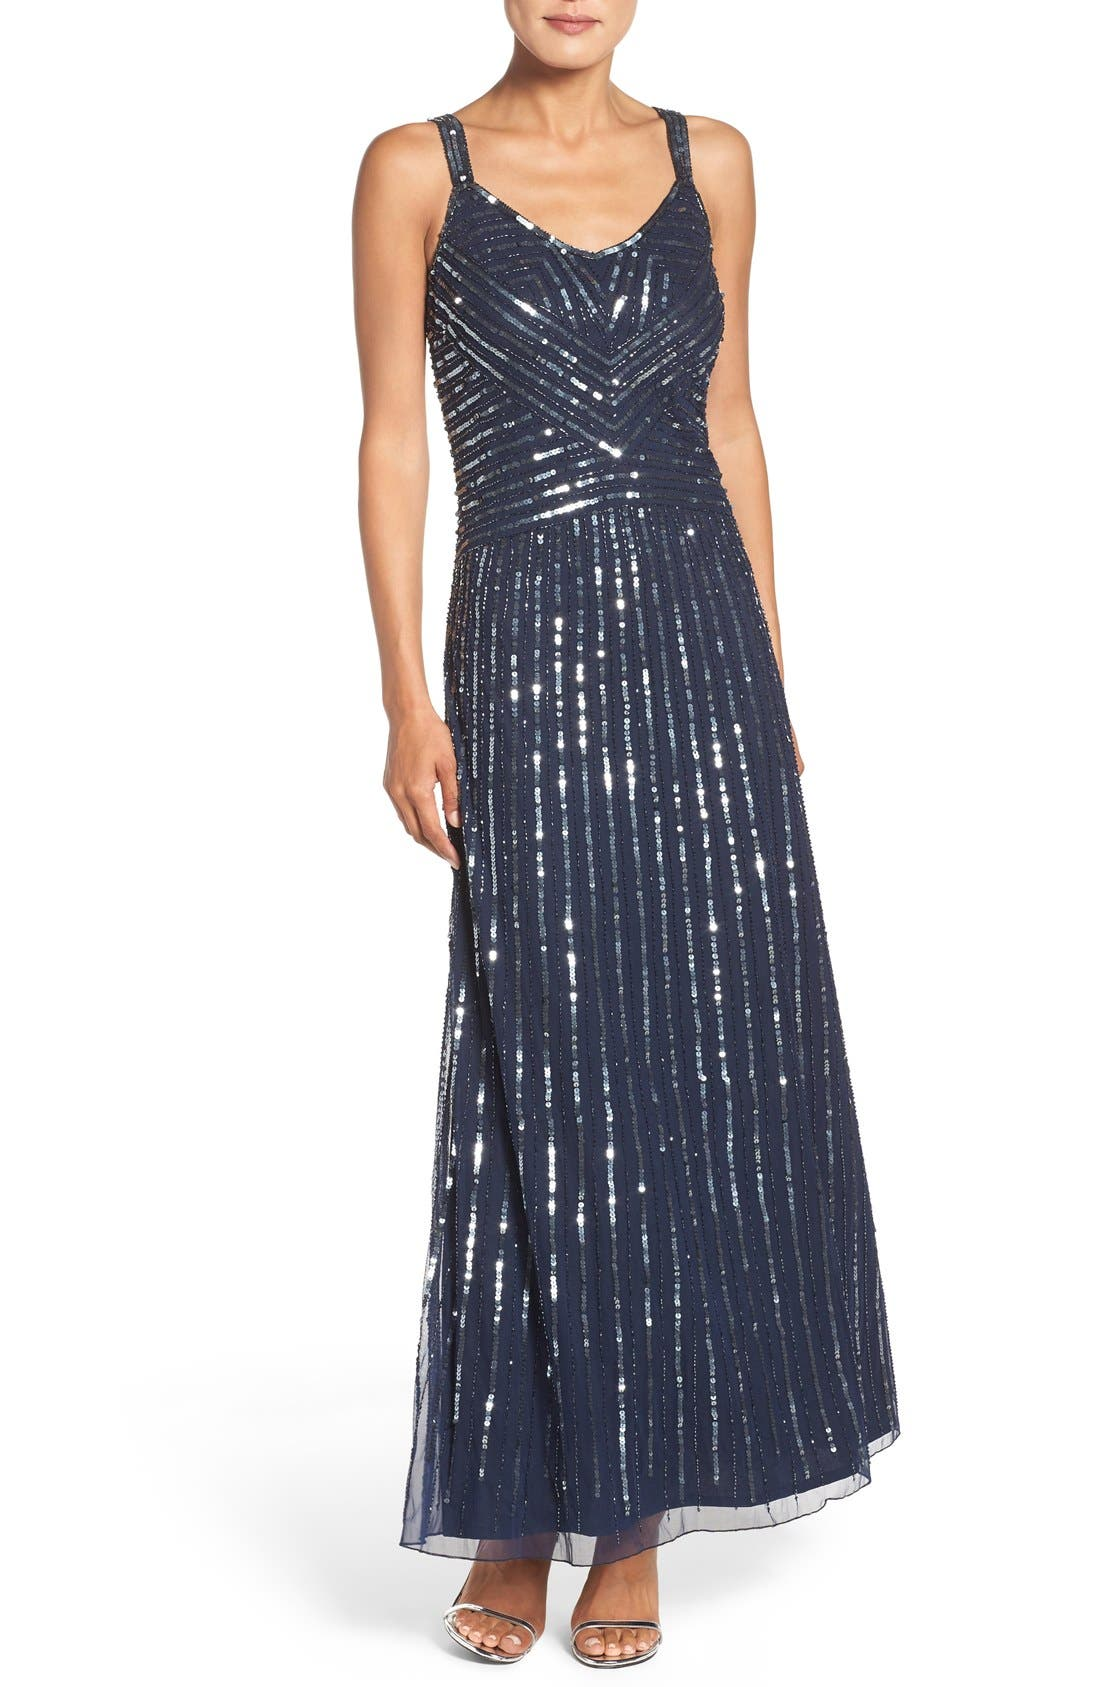 Main Image - Pisarro Nights Embellished Mesh Fit & Flare Dress